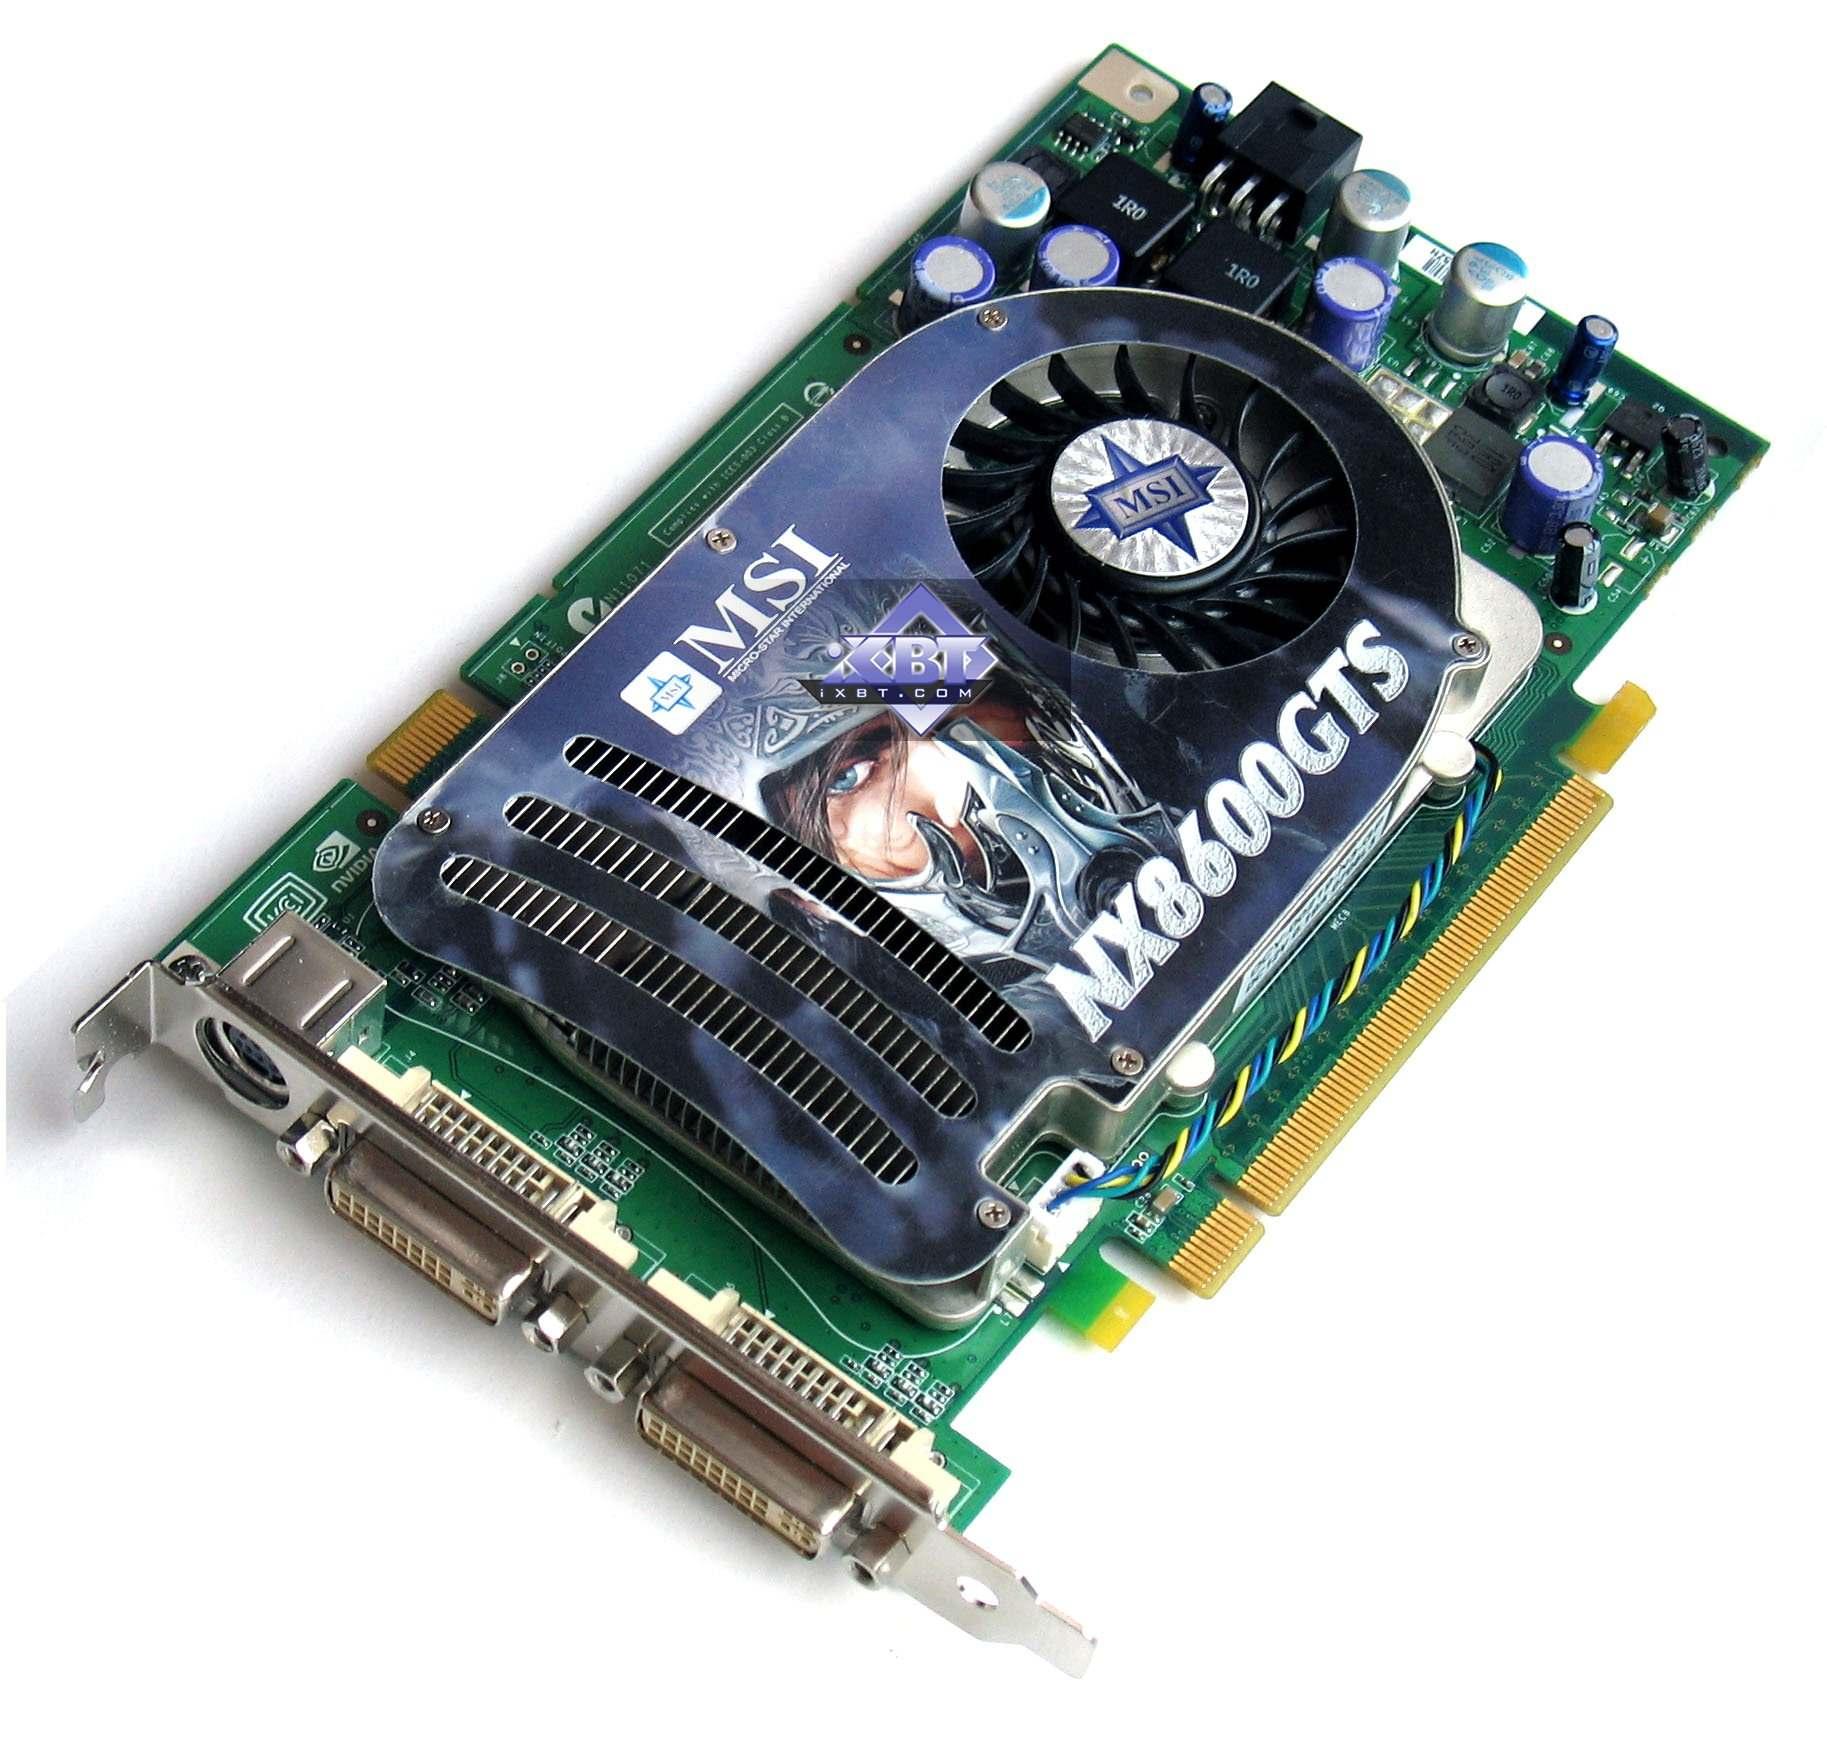 Nvidia Geforce 8600 Gt Драйвер Vista